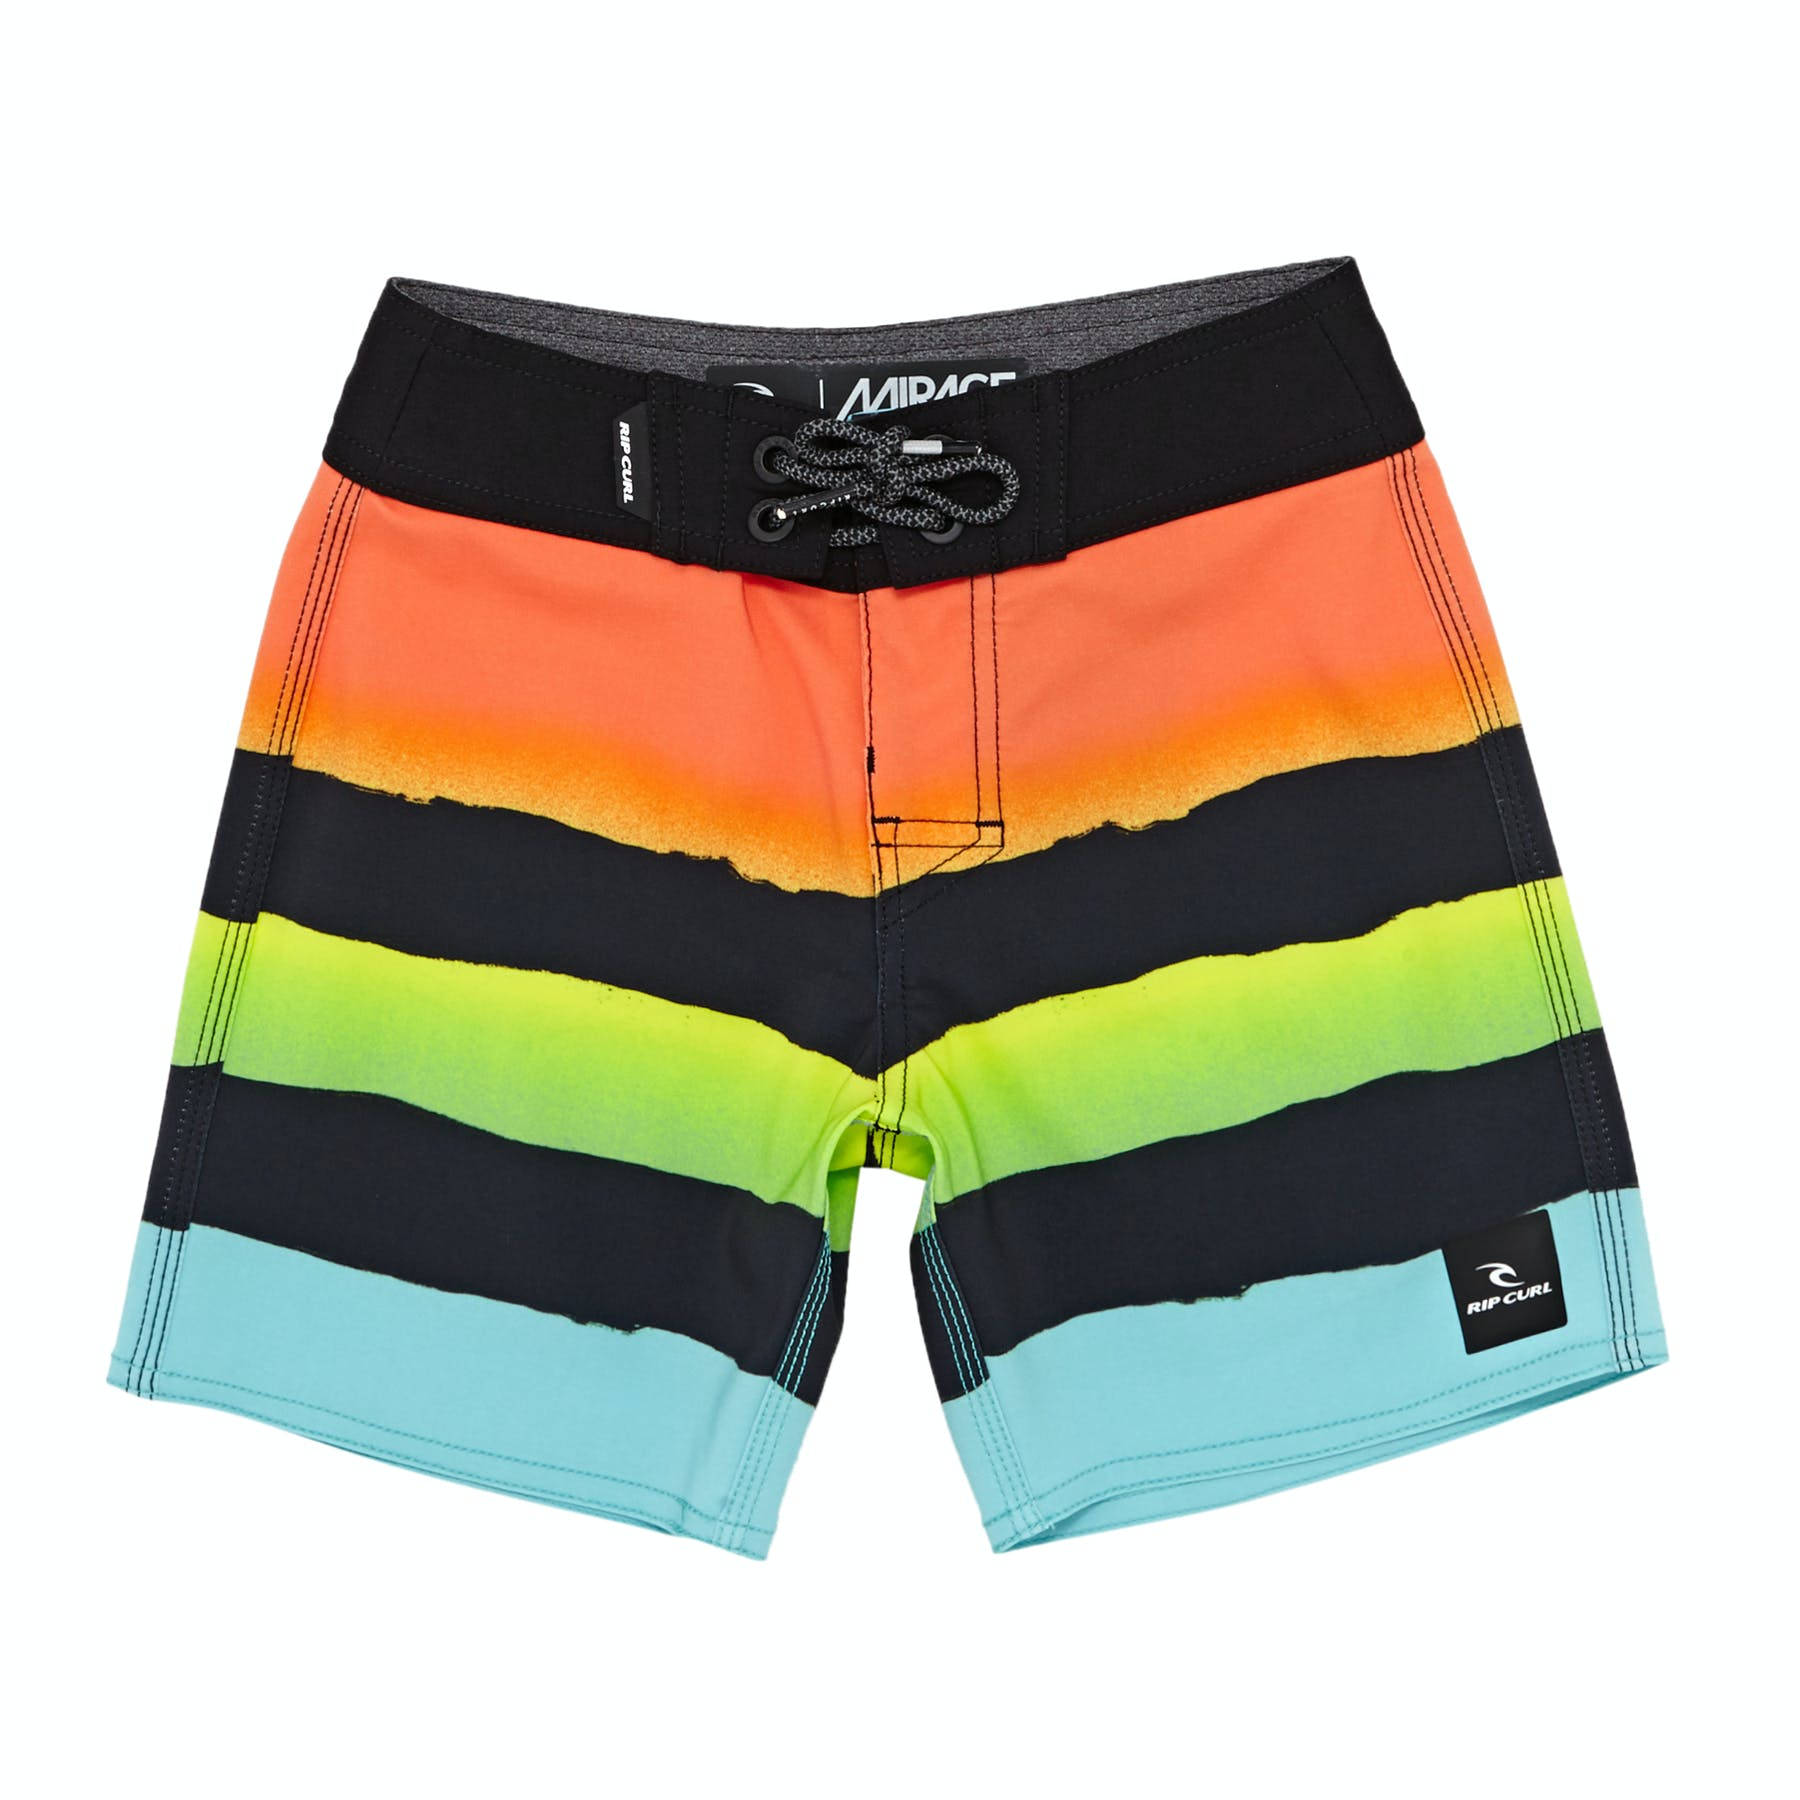 Pantaloncini da Surf Rip Curl Mirage Blowout Groms 12in